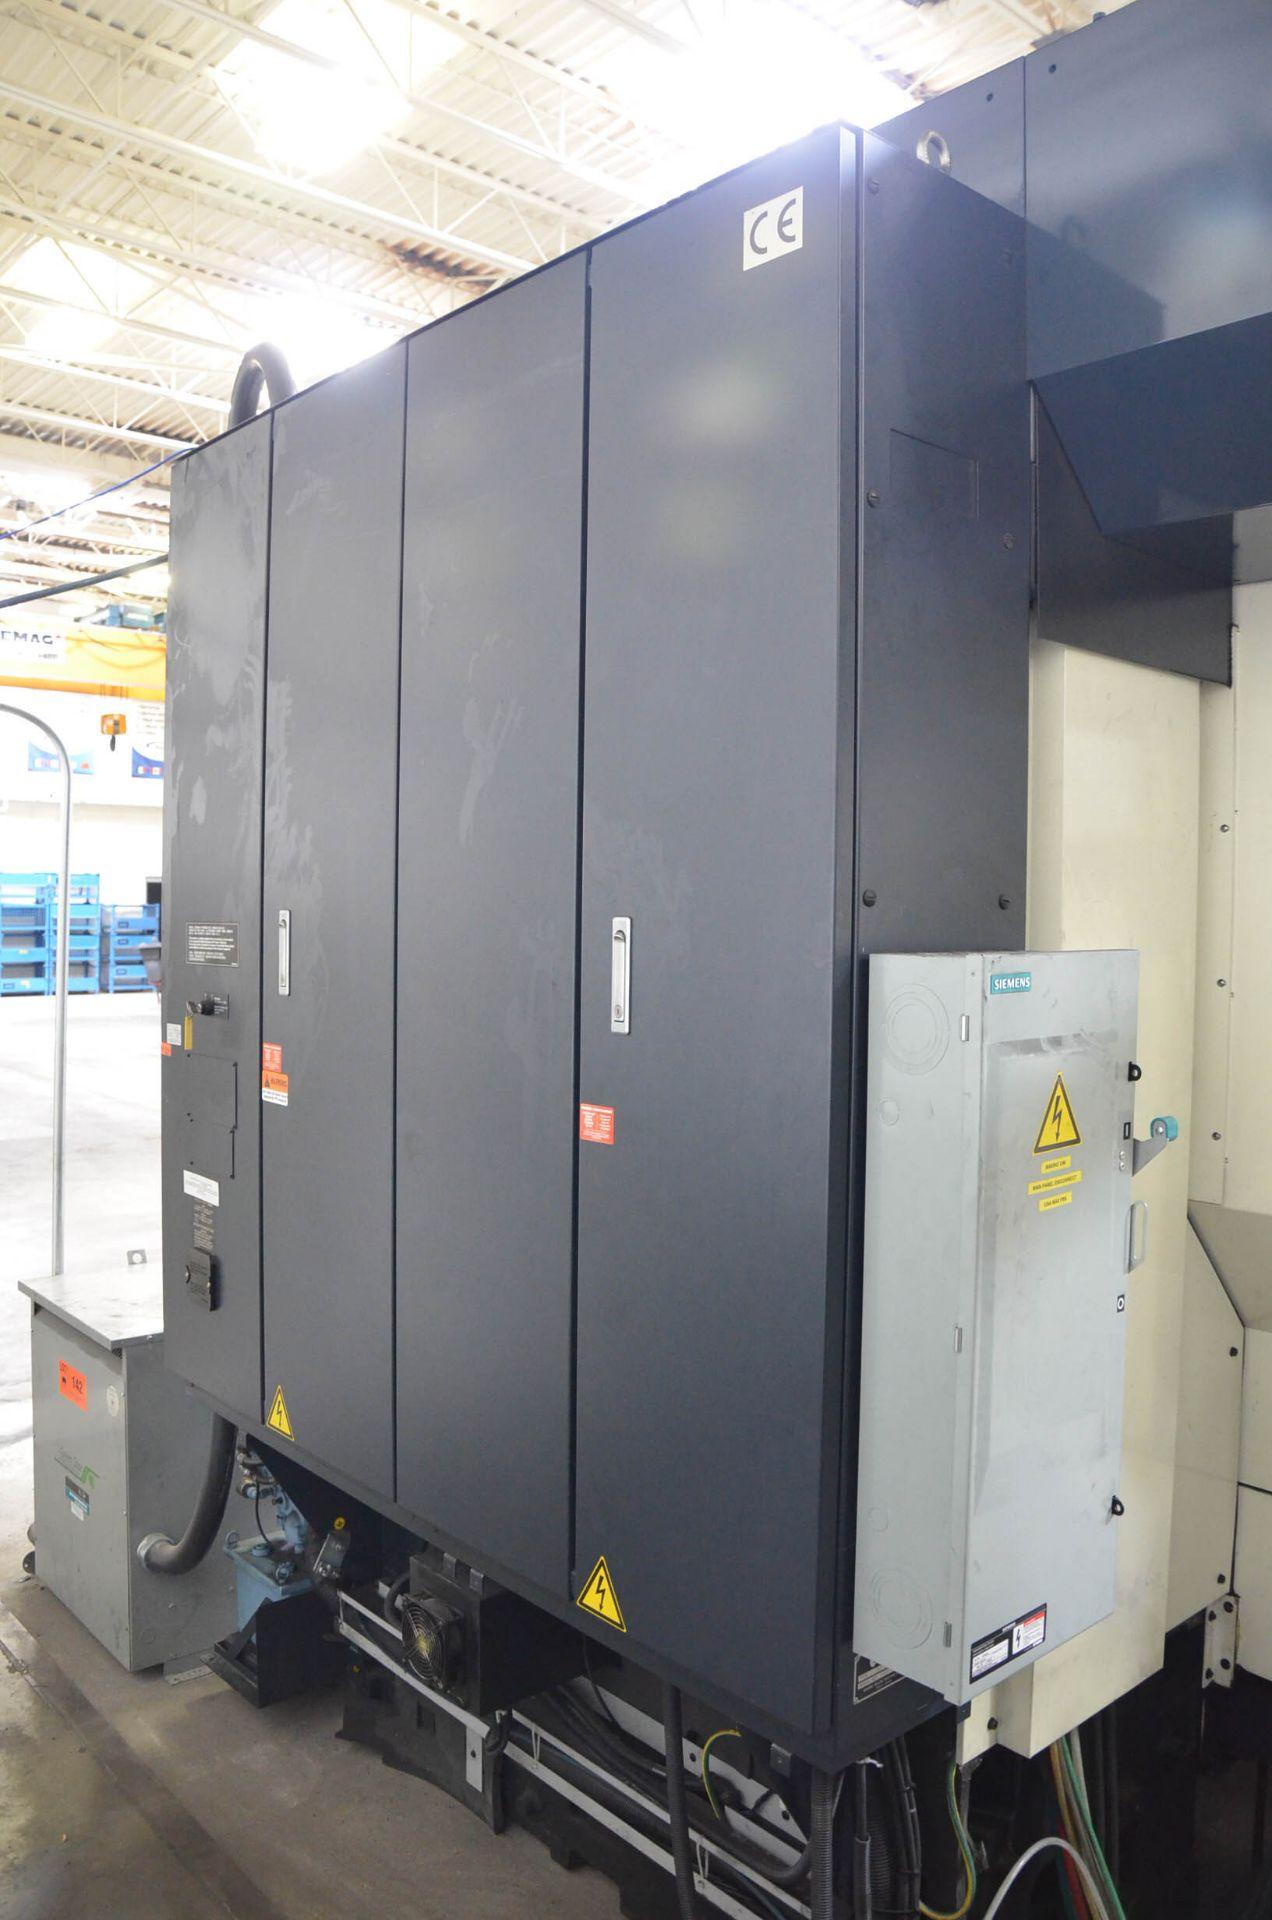 MAKINO (2008) V56 GRAPHITE CNC VERTICAL MACHINING CENTER WITH MAKINO PROFESSIONAL 5 TOUCHSCREEN - Image 5 of 10